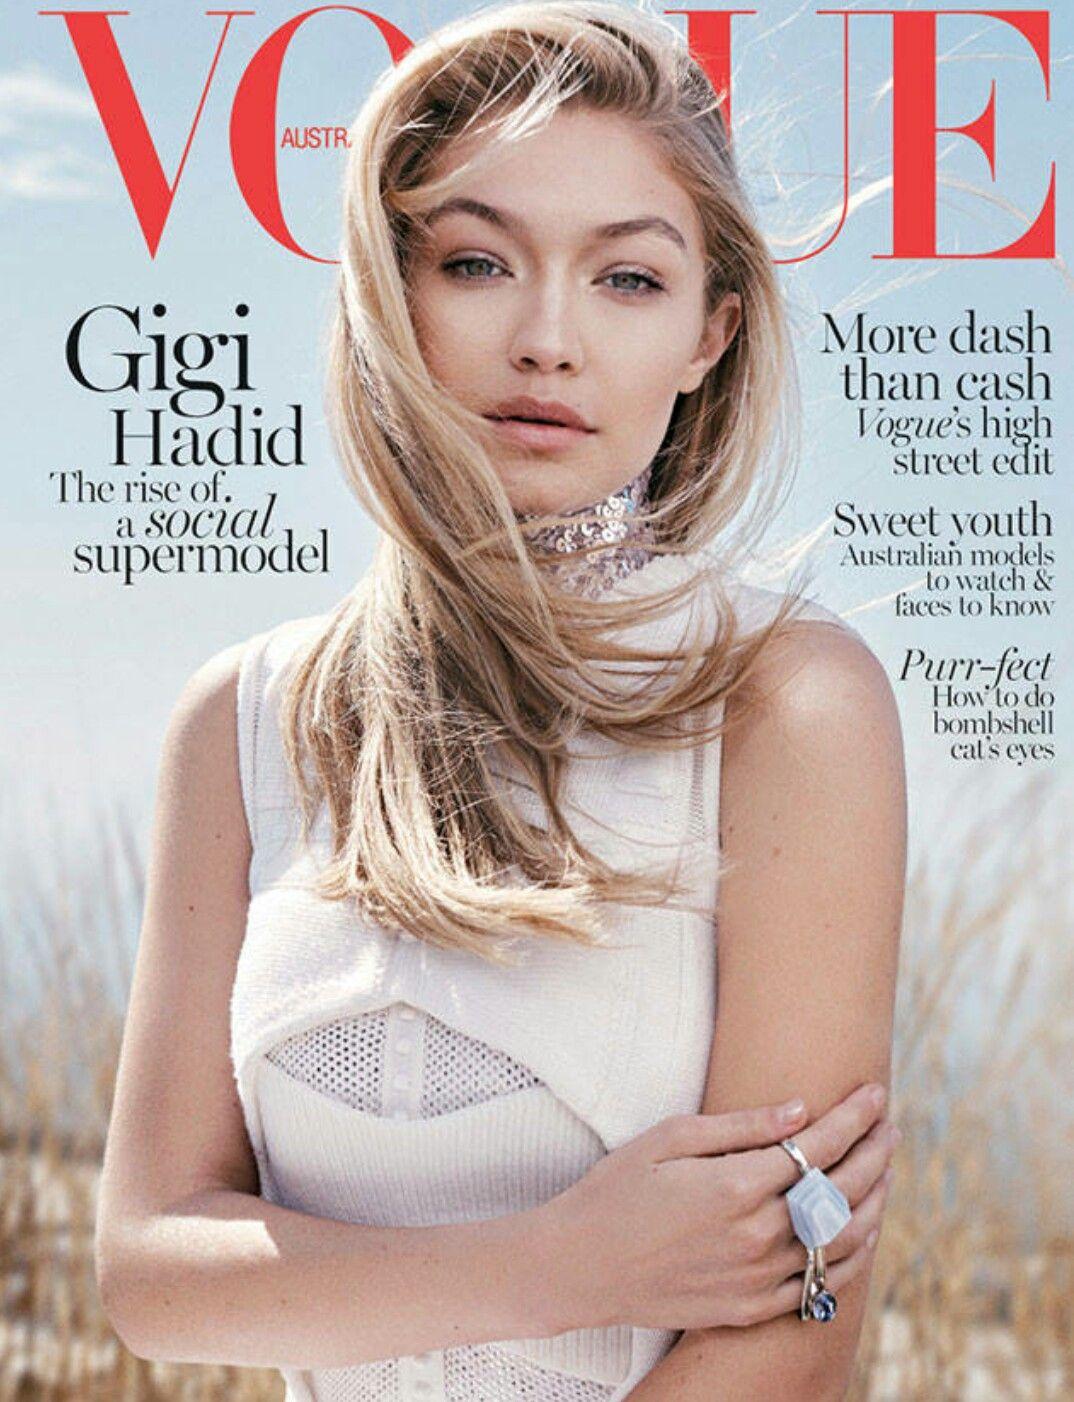 8aae3ddd9dcde Gigi Hadid for Vogue   Fashionable Ladies   Pinterest   Vogue, Vogue ...